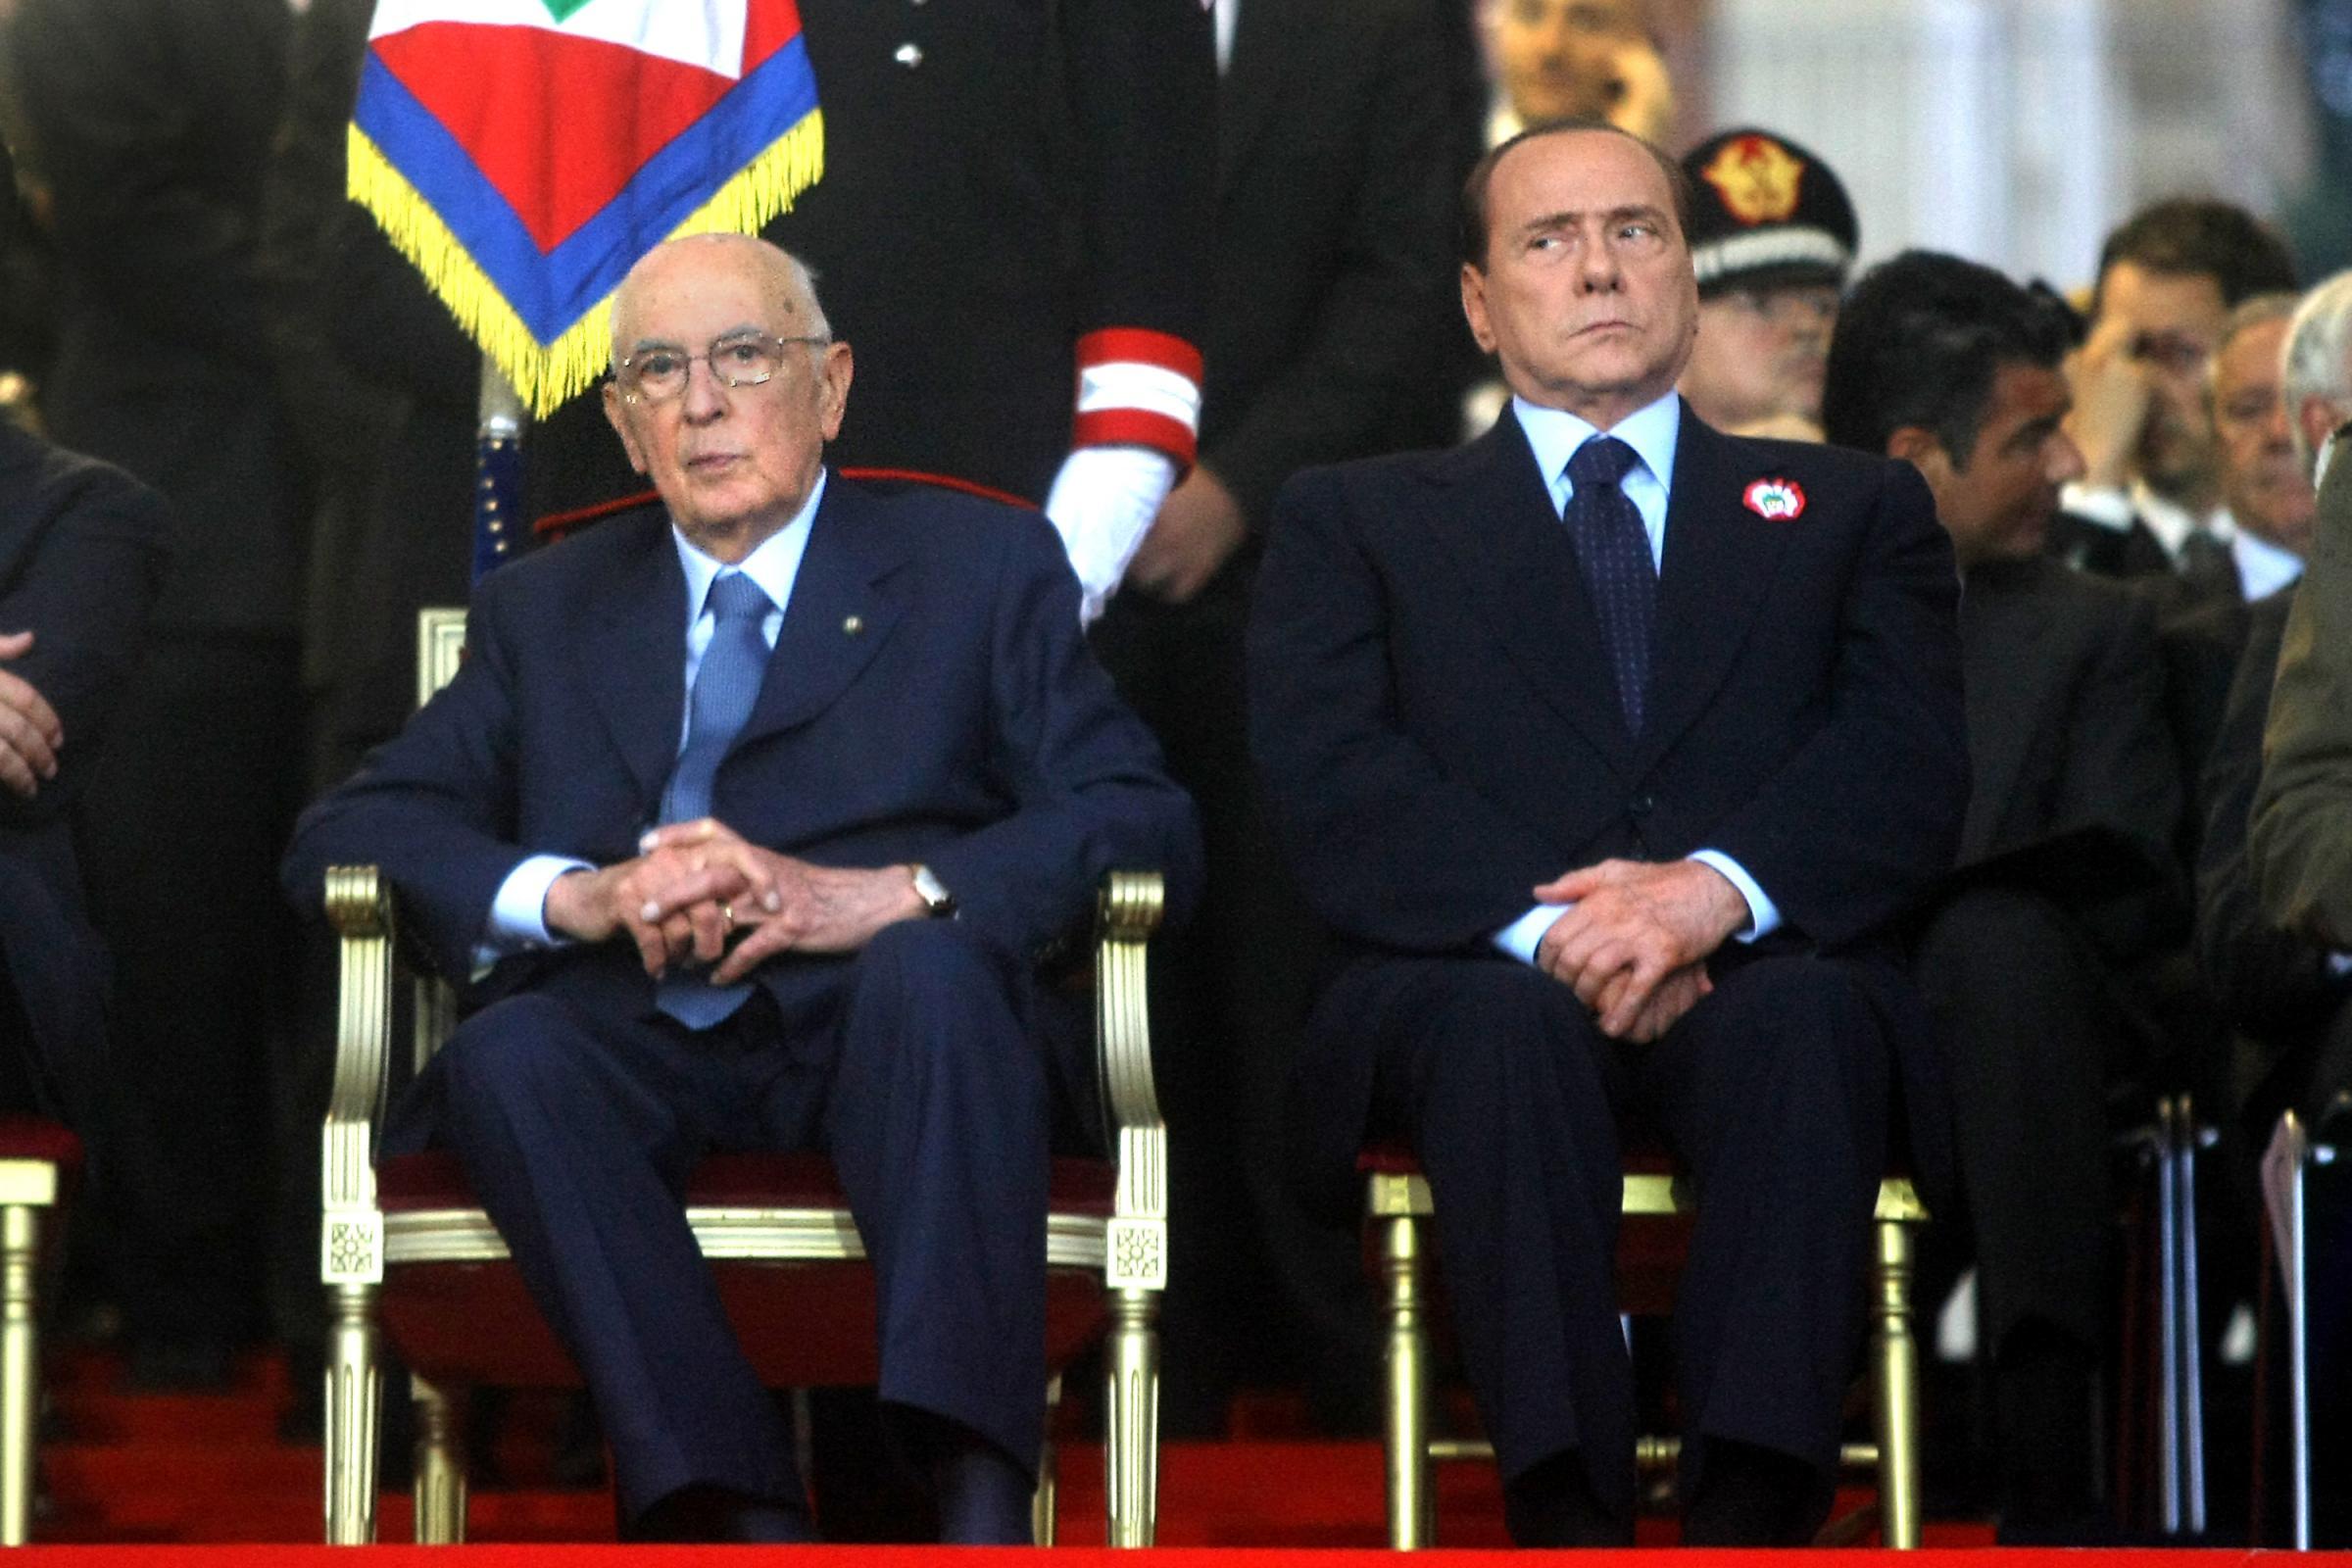 Napolitano: 'basta a conflitti fra politica e giustizia'